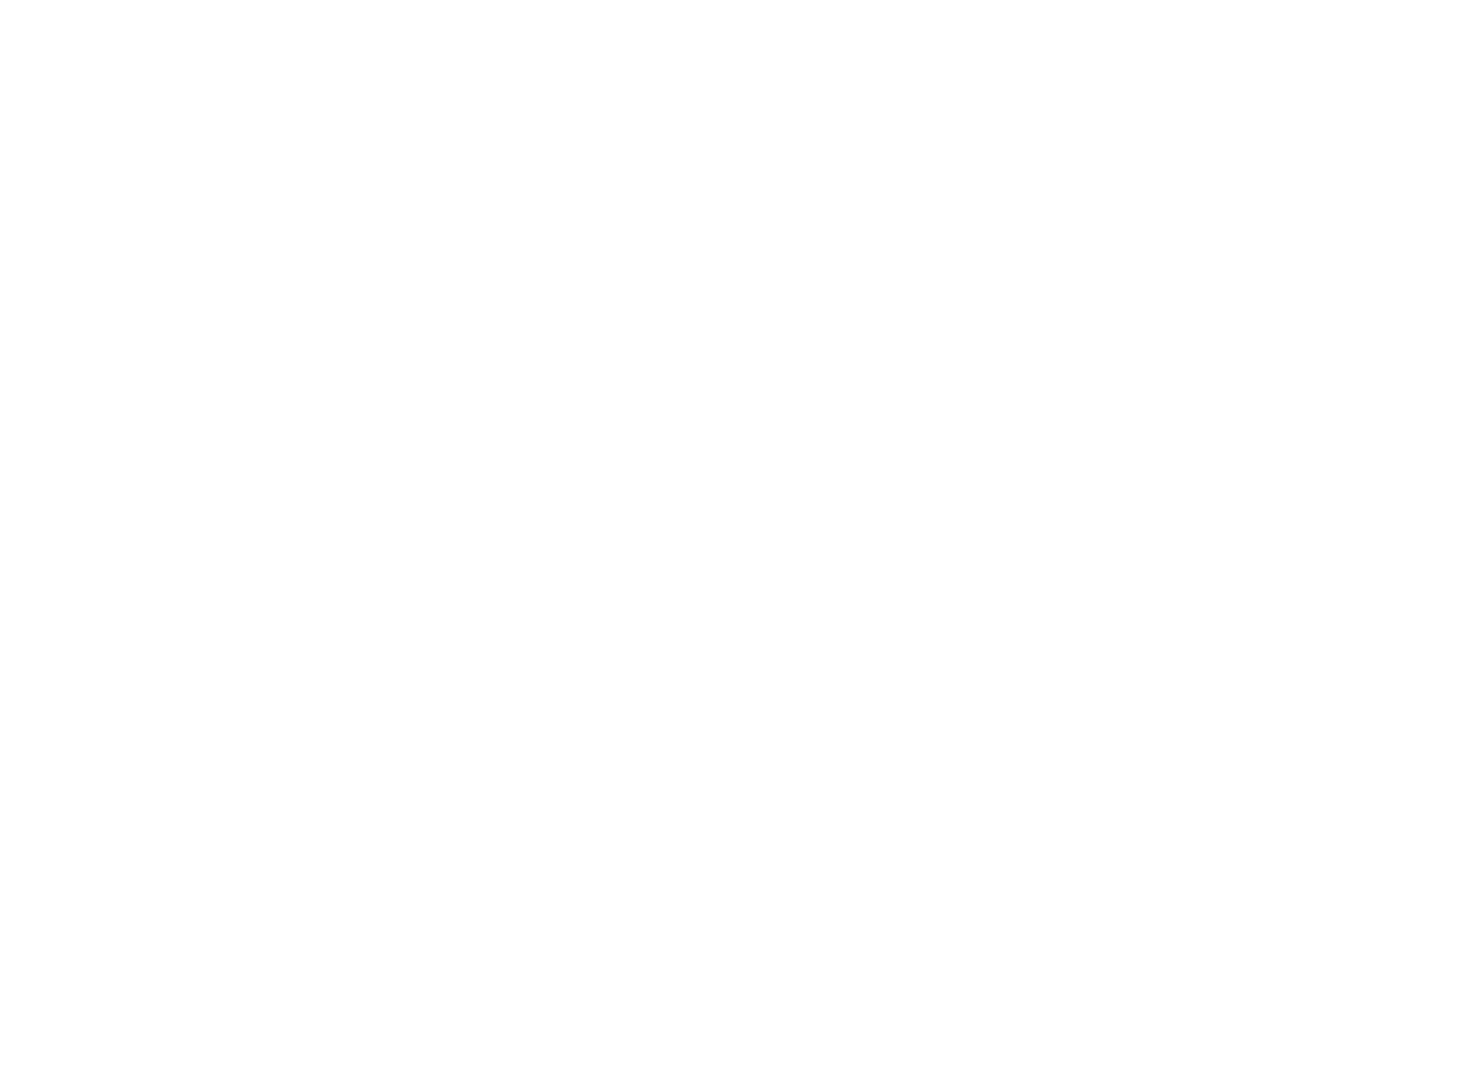 Official Discord Server